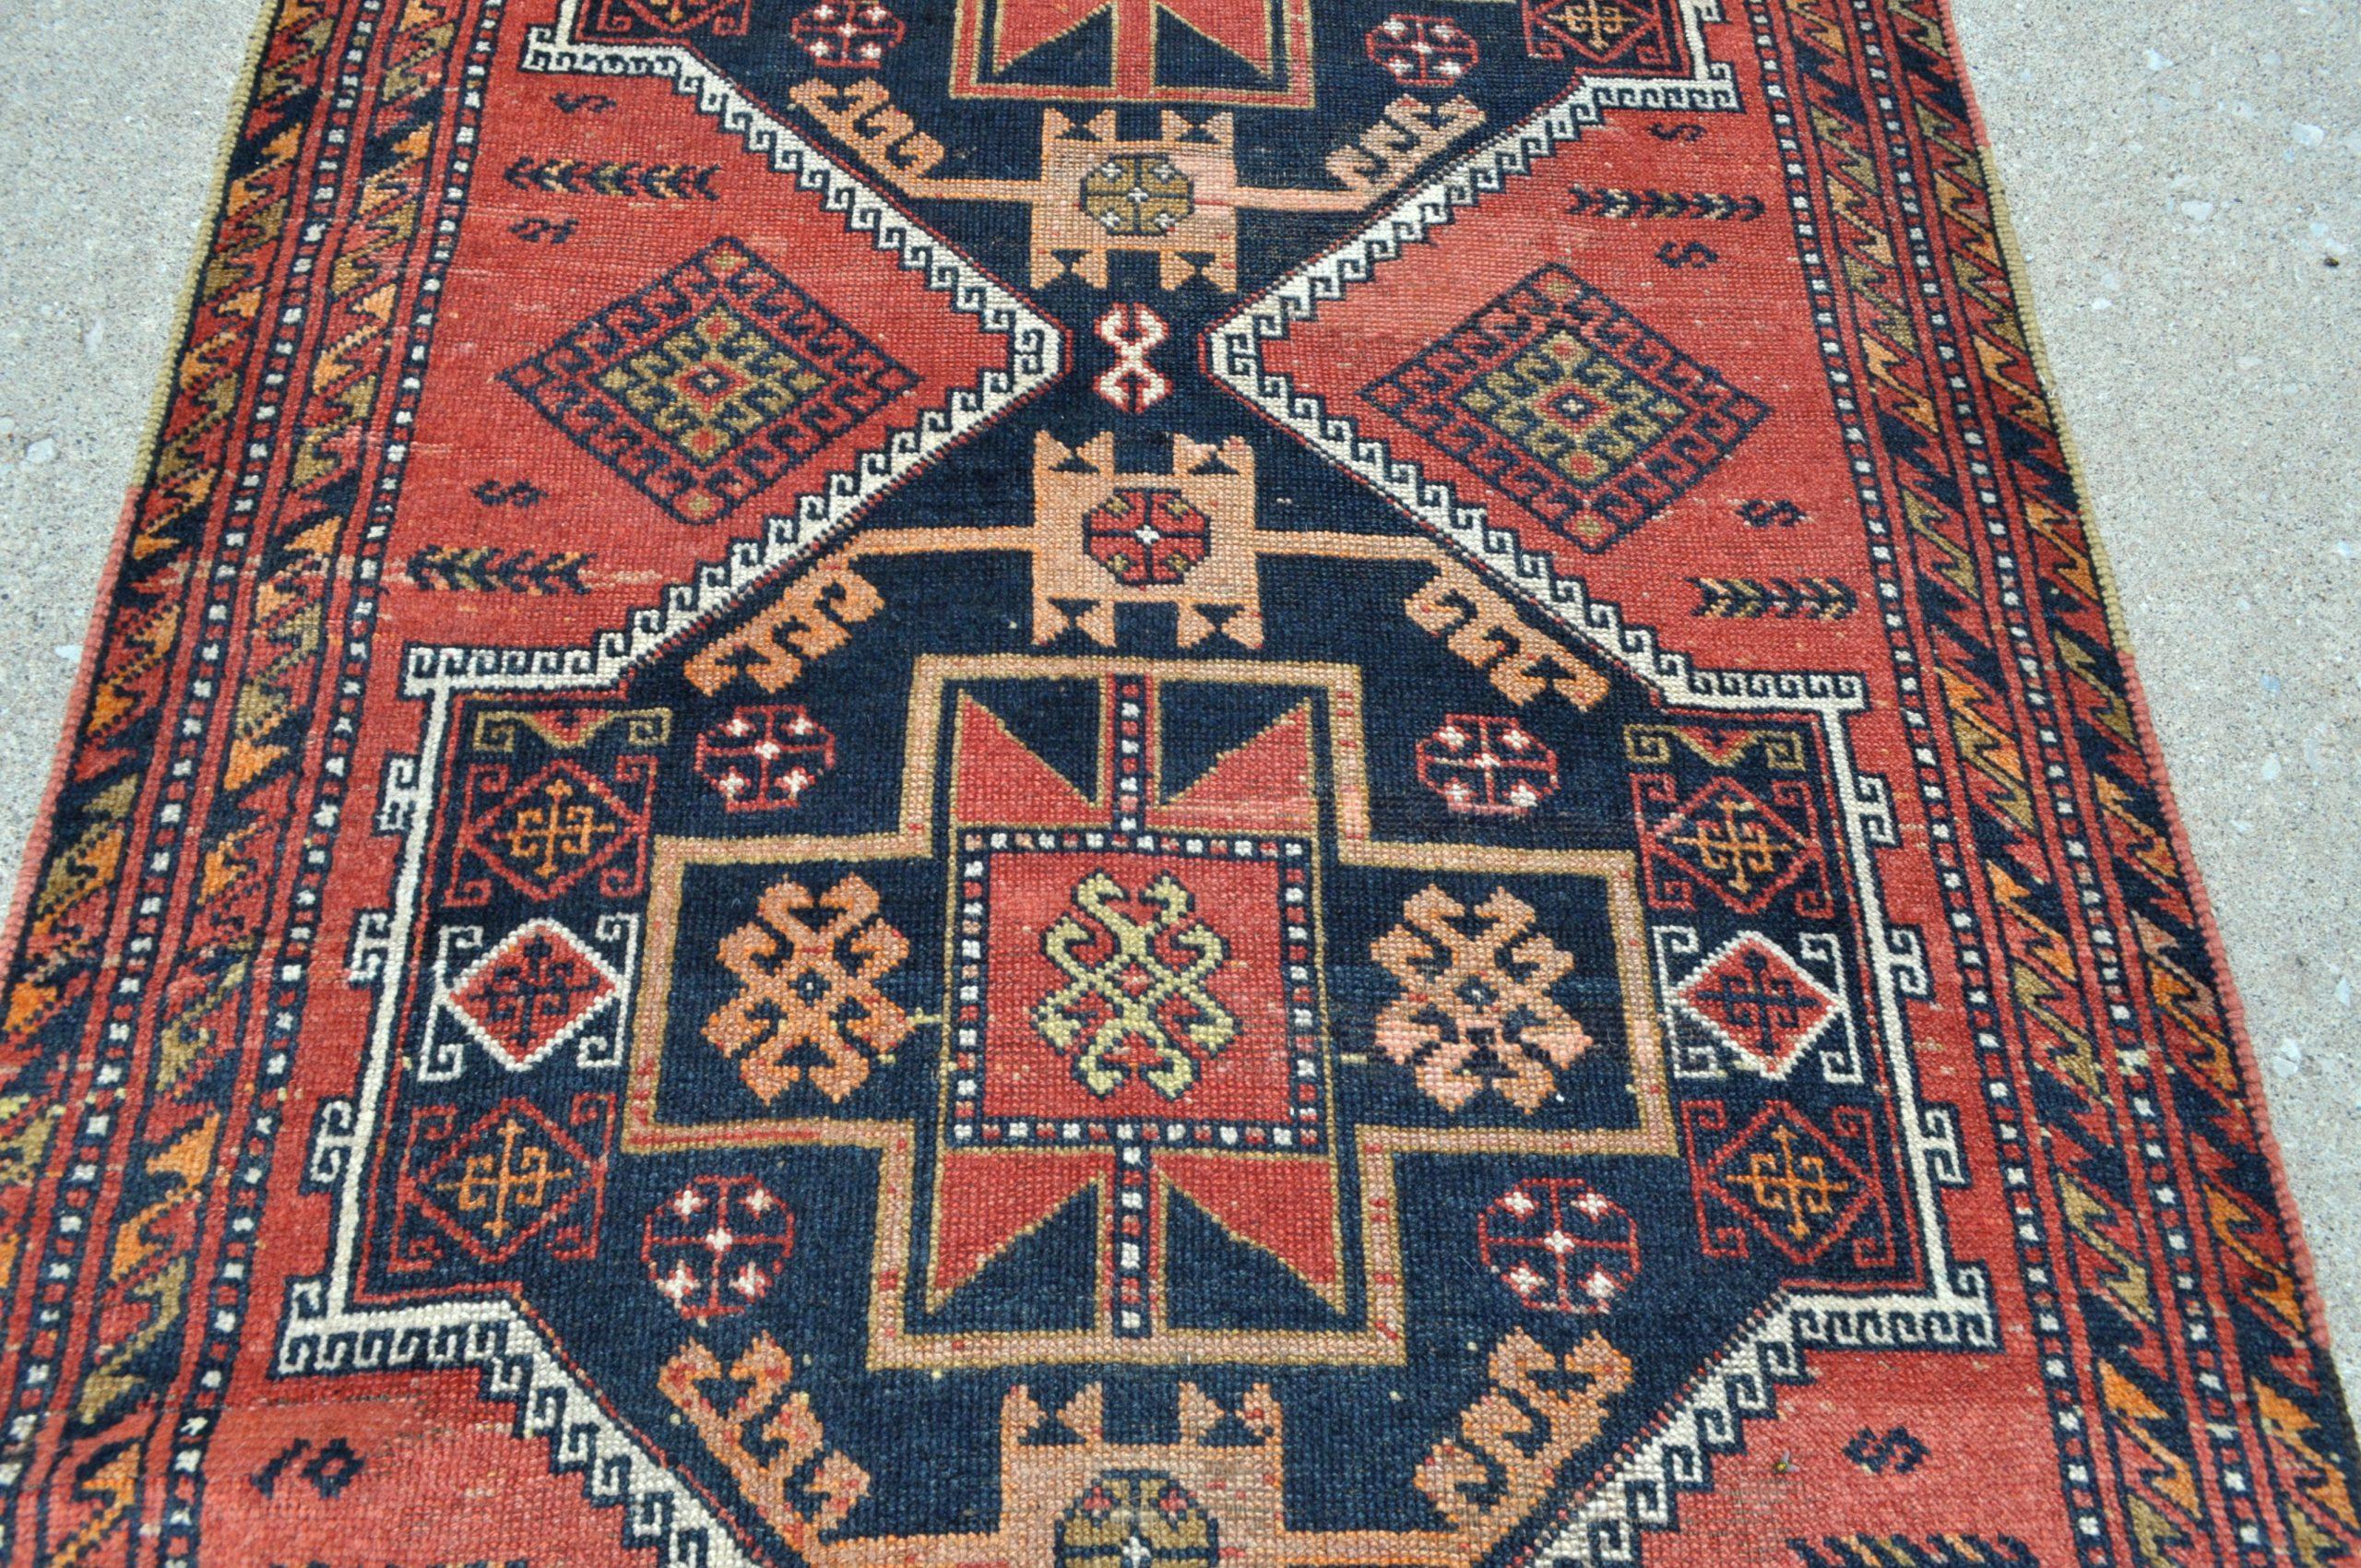 Turkey Hallway Carpet 26x111 Inc Green Carpet 8367 Turkish Rug Office Kitchen Carpet Vintage Rug Runner Carpet Antique Rug